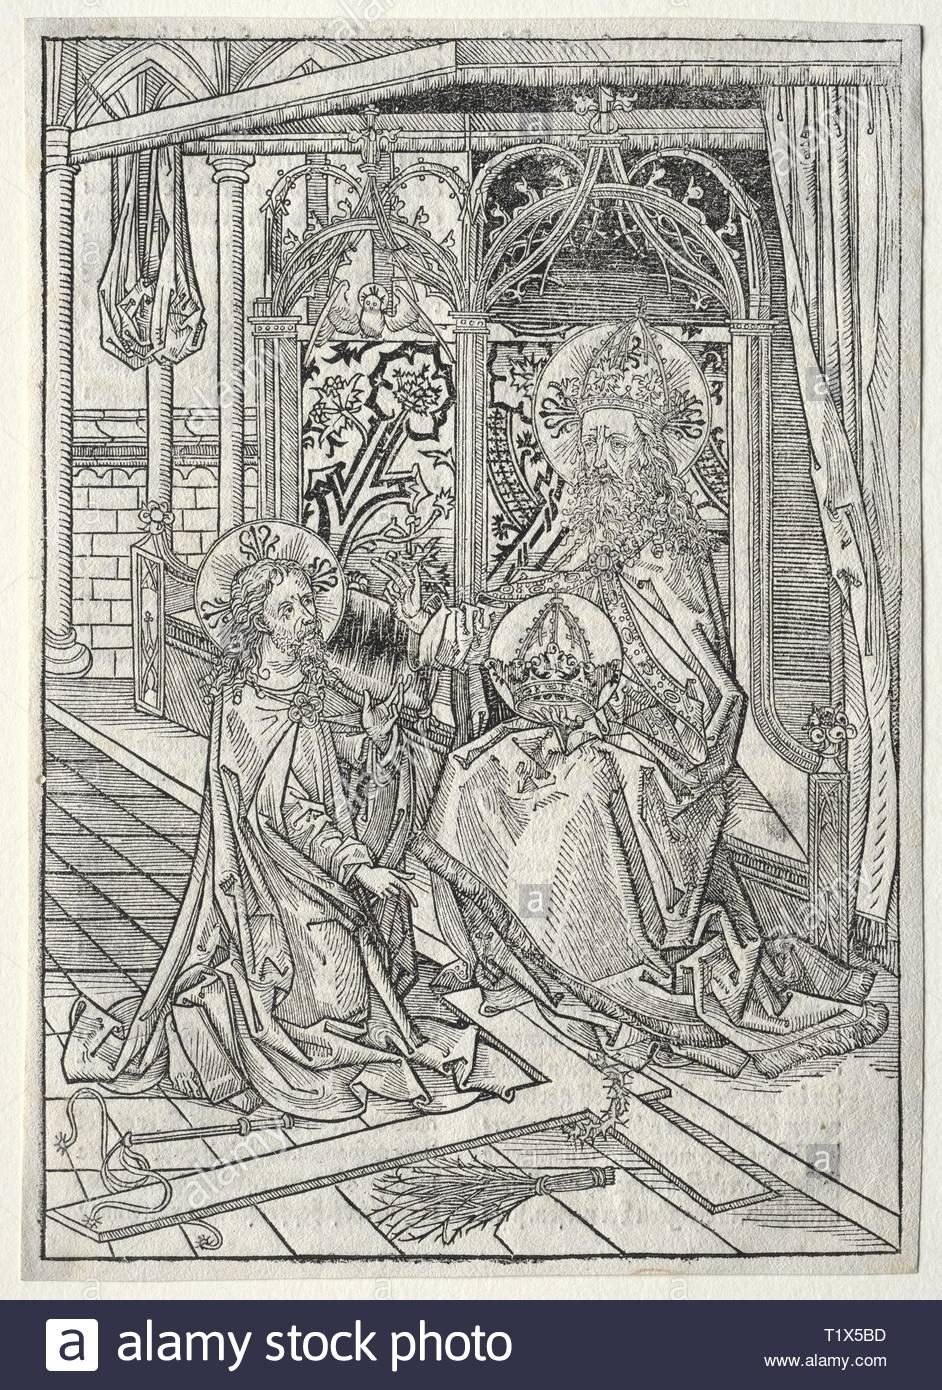 Der Schatzbehalter: The Trinity, 1491. Michael Wolgemut (German, 1434-1519). Woodcut. - Stock Image